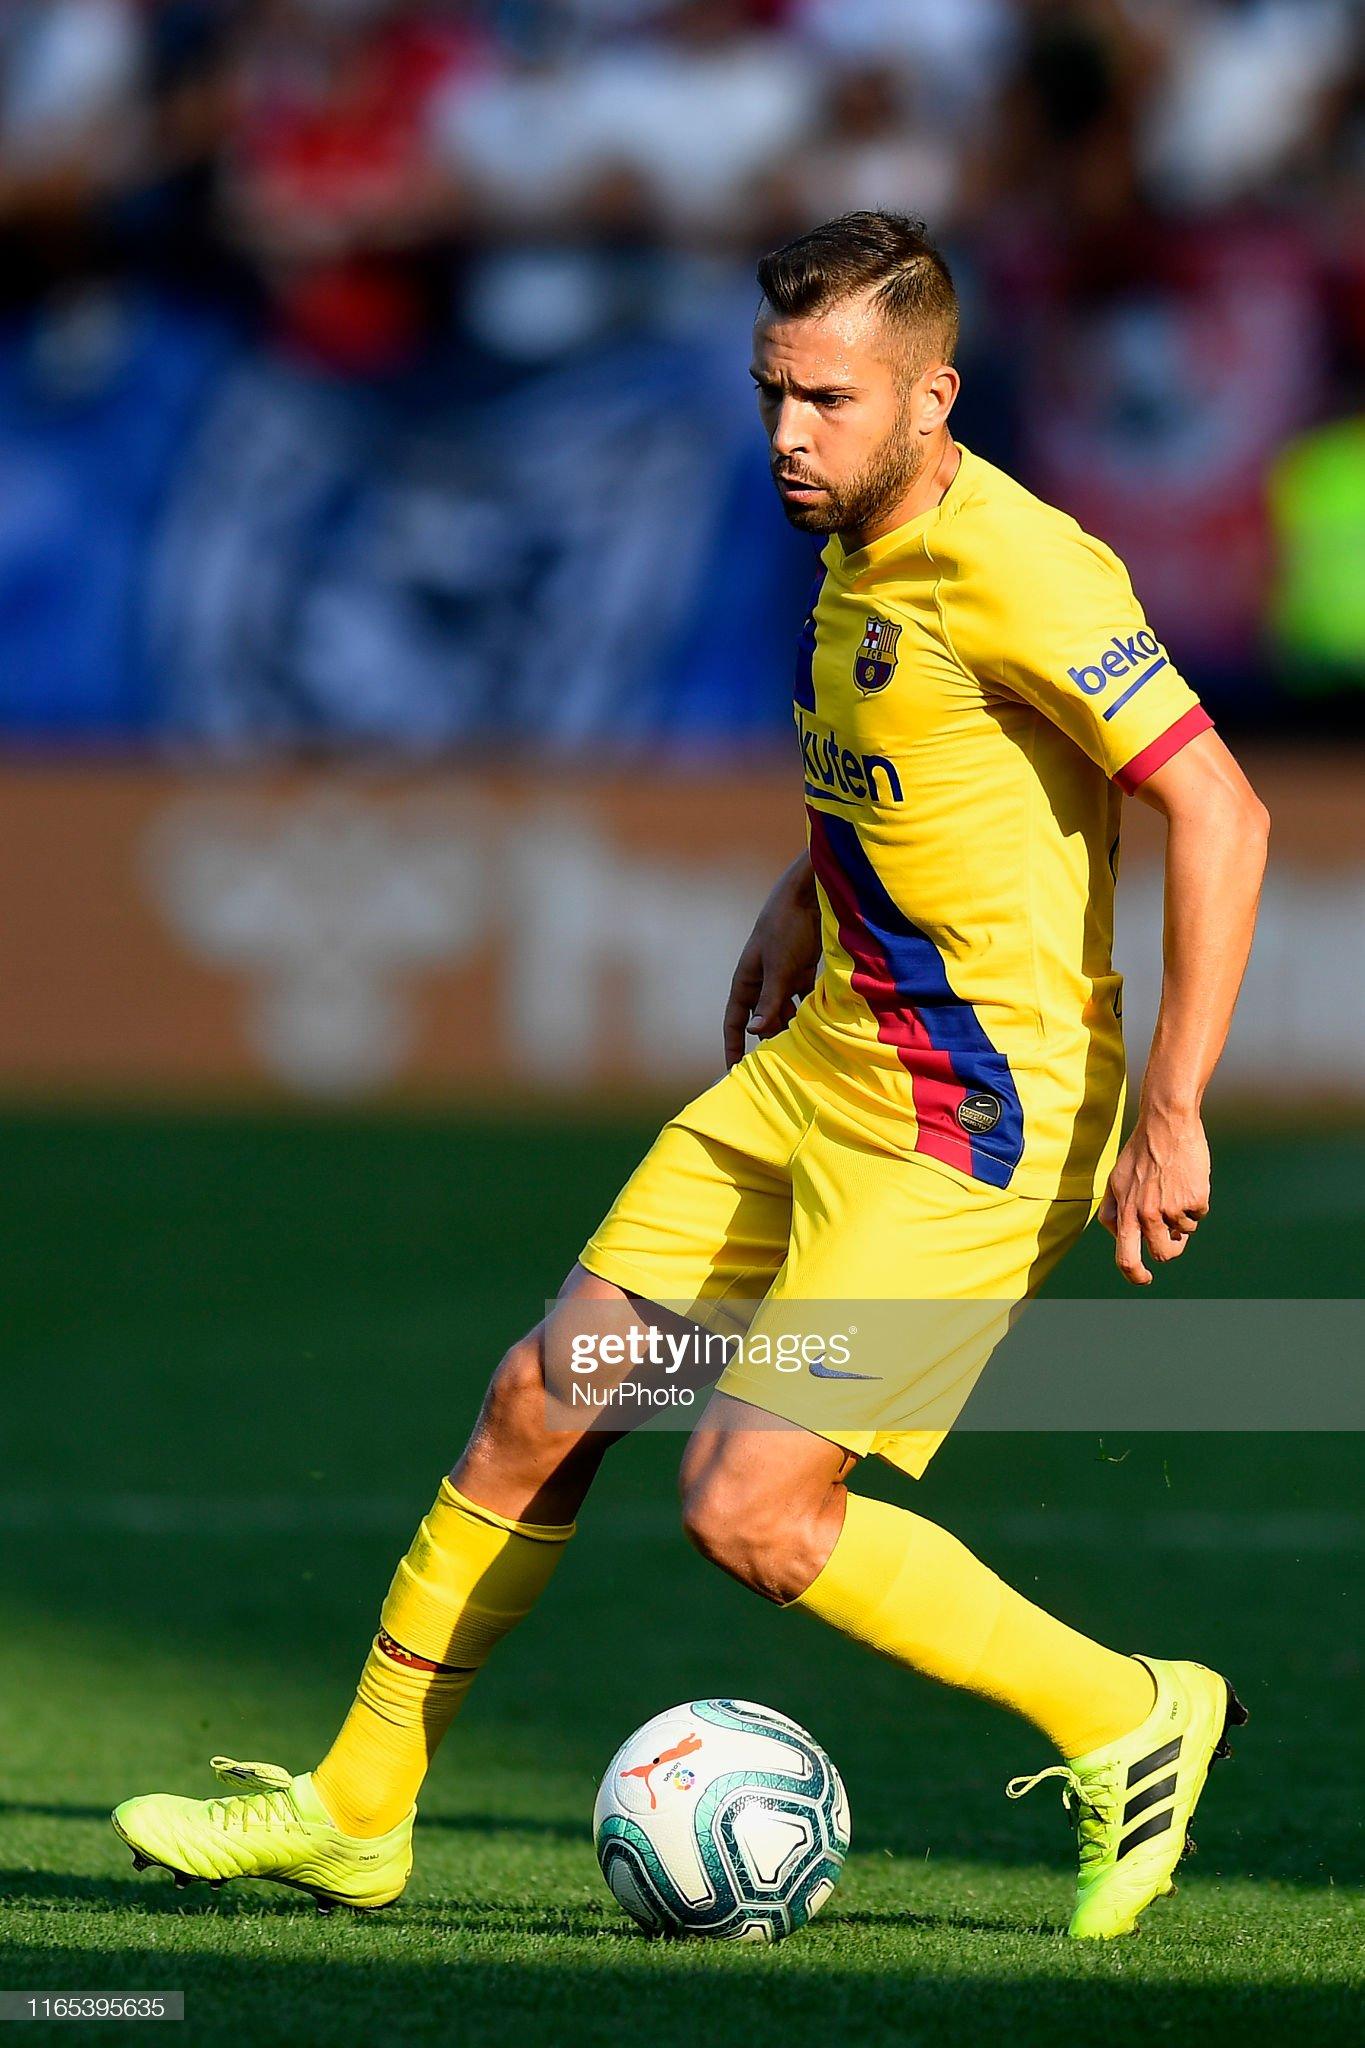 صور مباراة : أوساسونا - برشلونة 2-2 ( 31-08-2019 )  Jordi-alba-of-barcelona-ina-action-during-the-liga-match-between-ca-picture-id1165395635?s=2048x2048